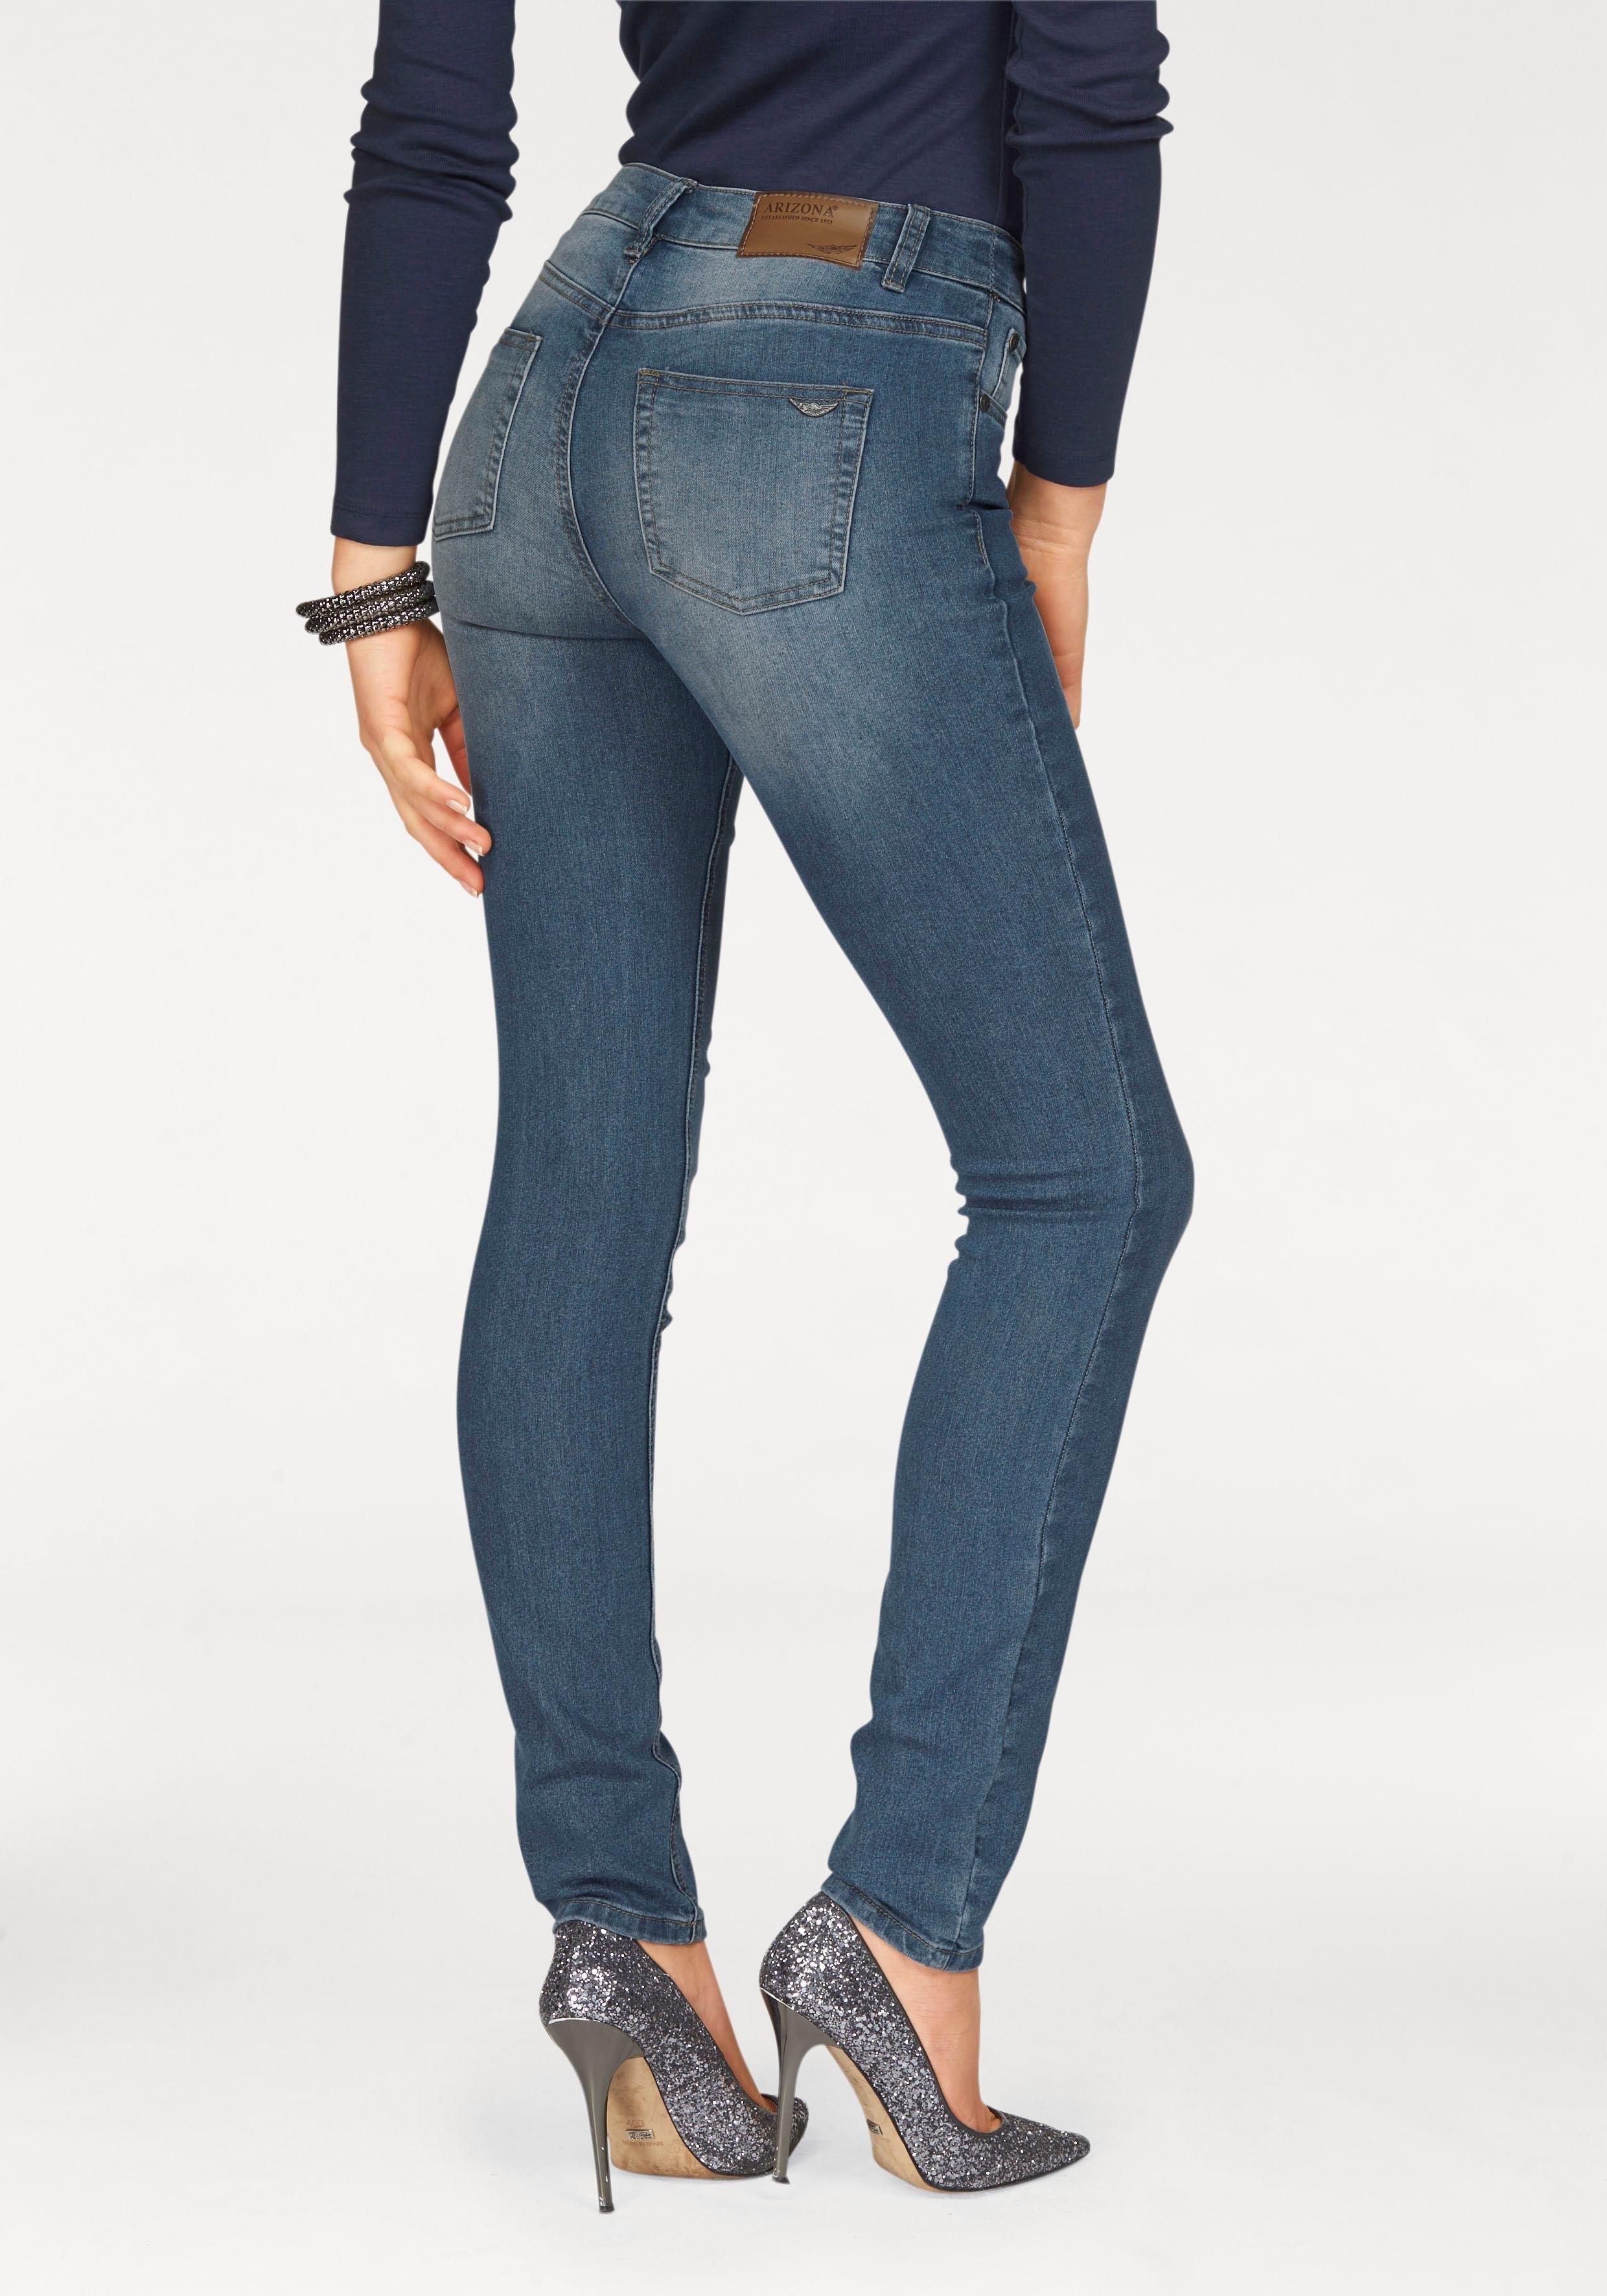 588005212e5 ... bootcutjeans »Ultra-Stretch«, Buffalo jeansbermuda met  destroyed-effecten, ARIZONA High-waist-jeans Bootcut, ARIZONA Bootcut-jeans  in five-pocketsstijl